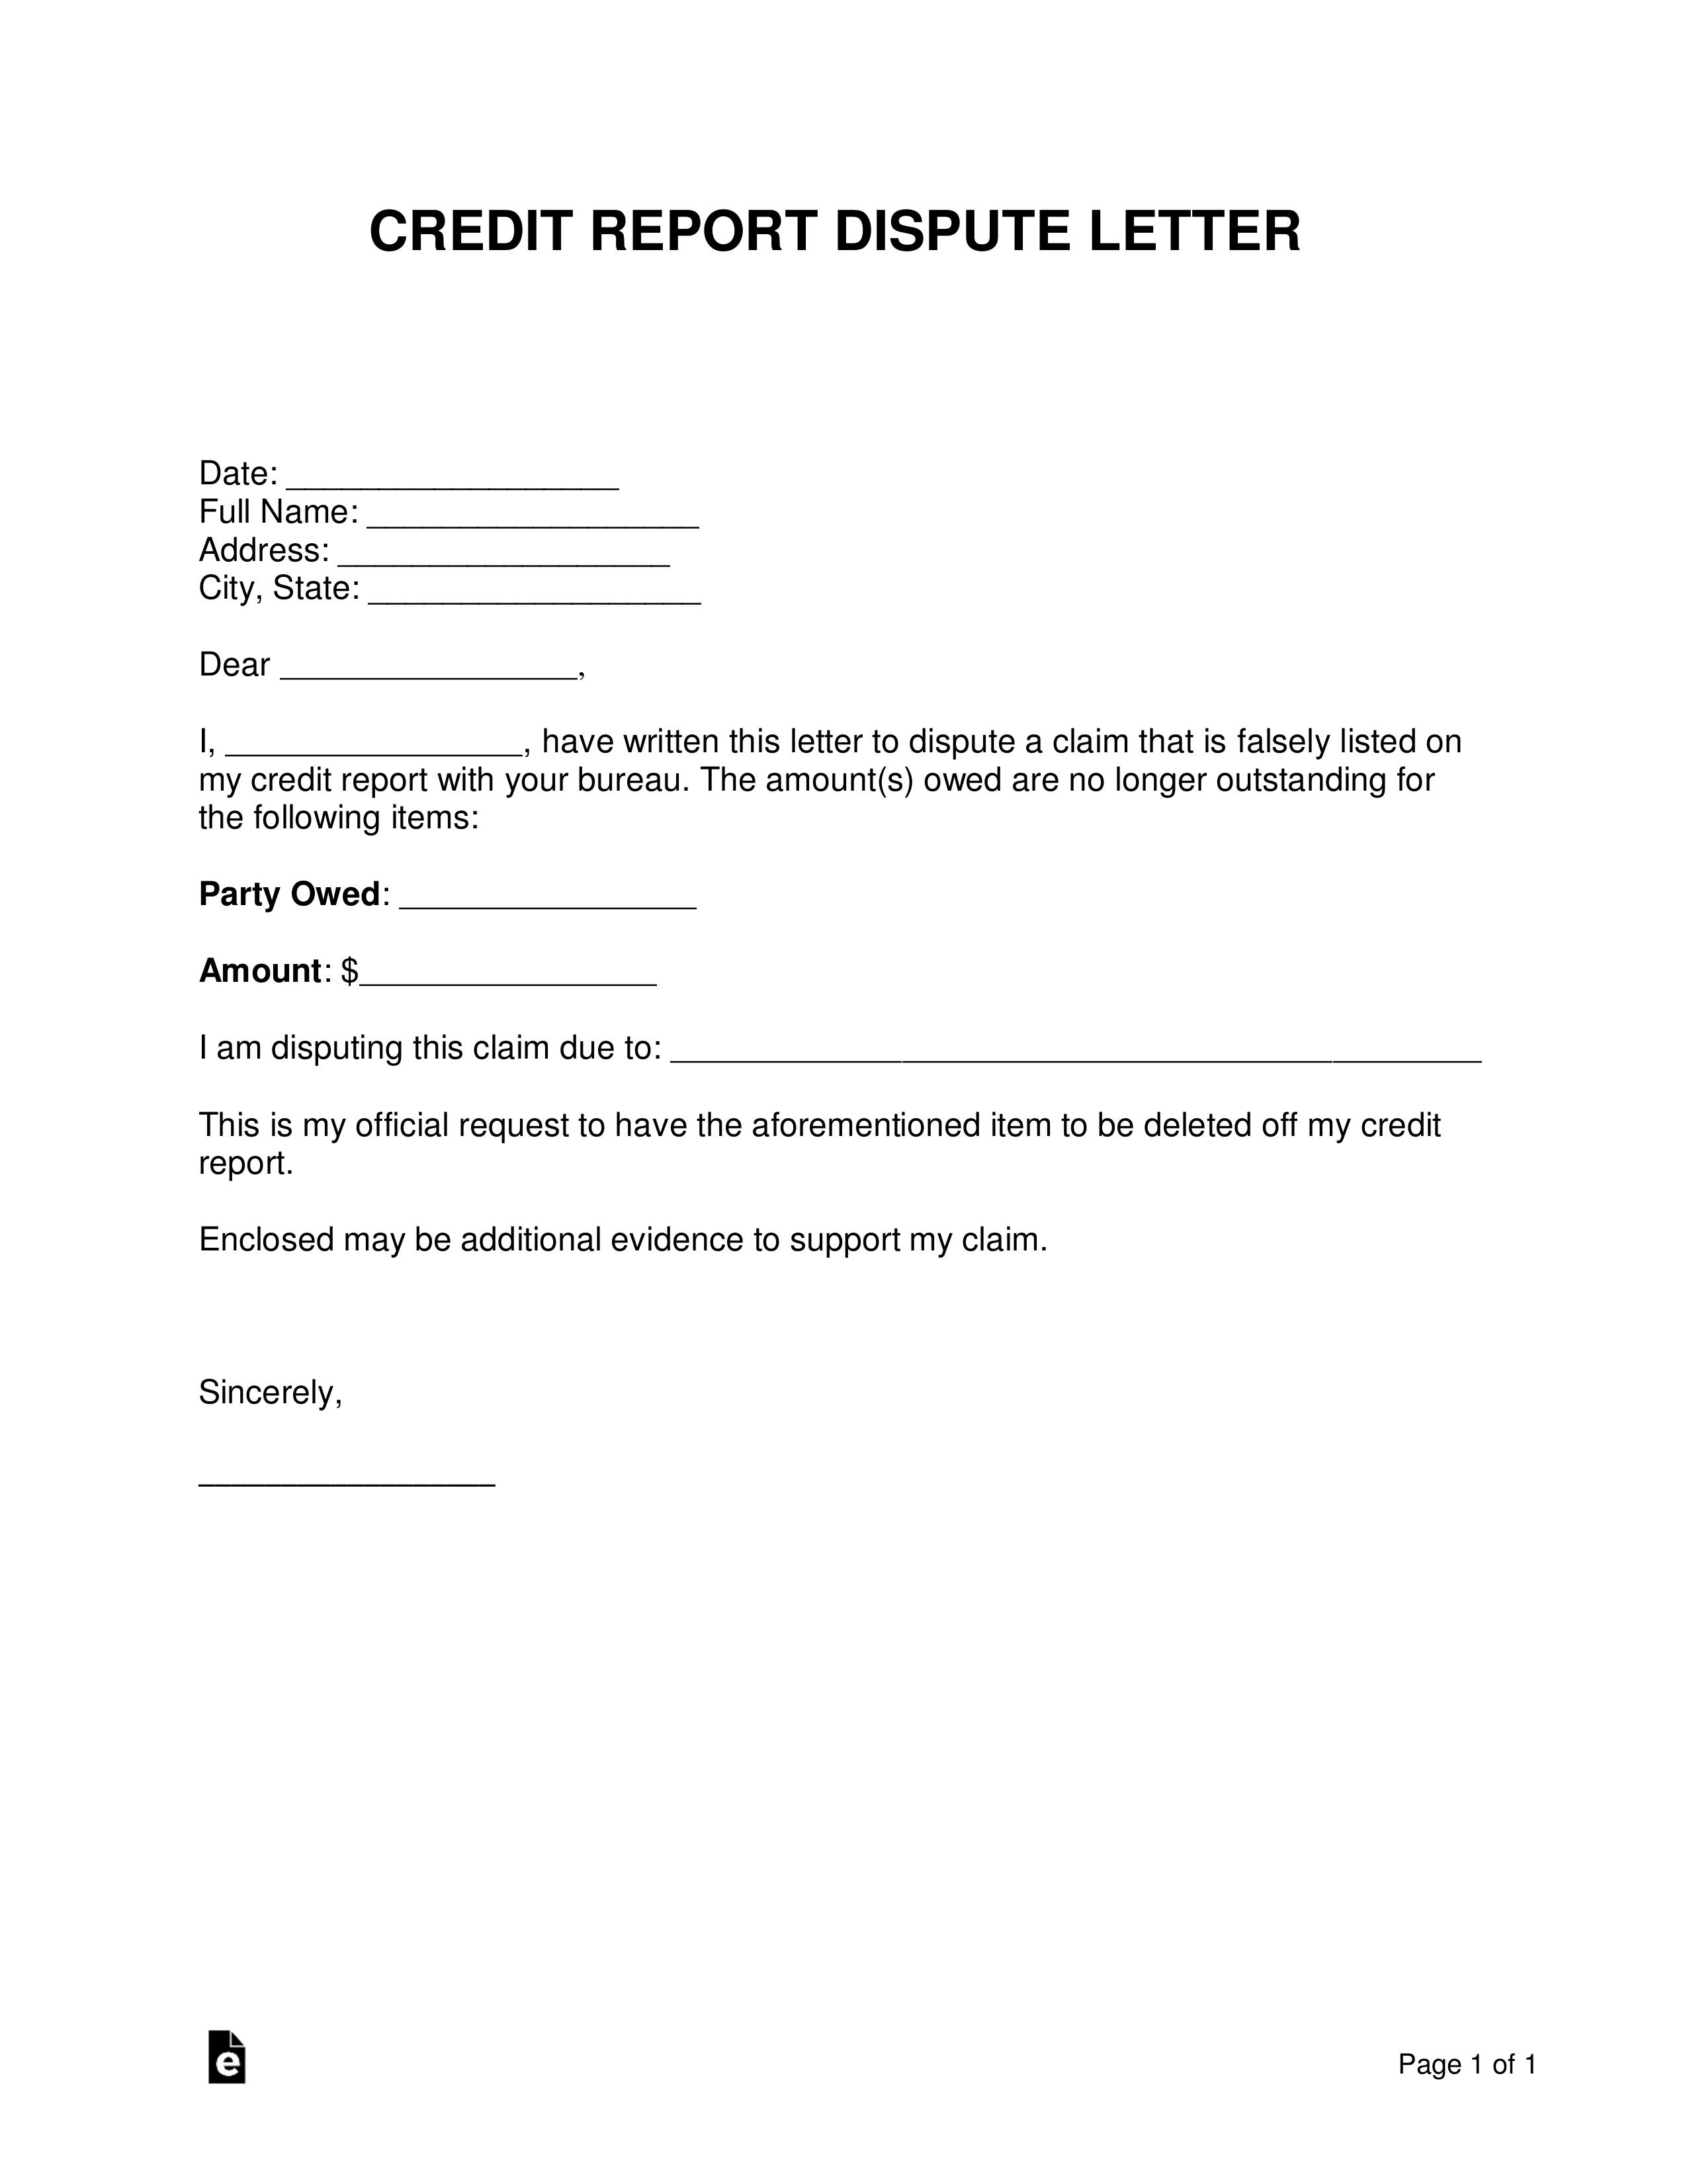 Free Credit Report Dispute Letter Template - Sample - Word Within Credit Report Dispute Letter Template